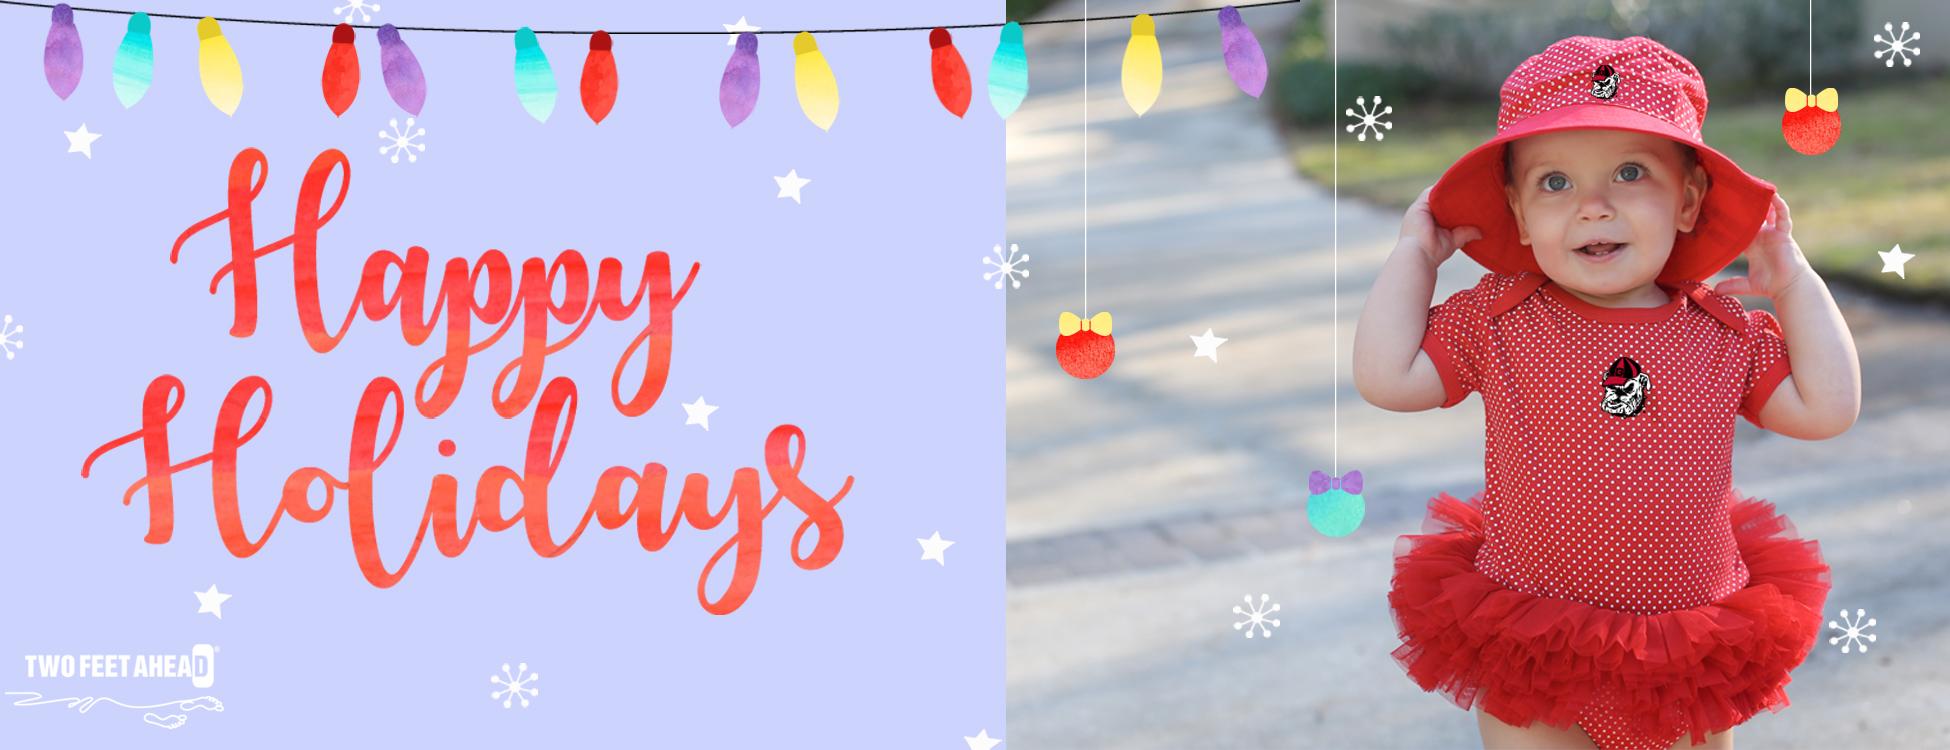 Happy Holidays_2.jpg